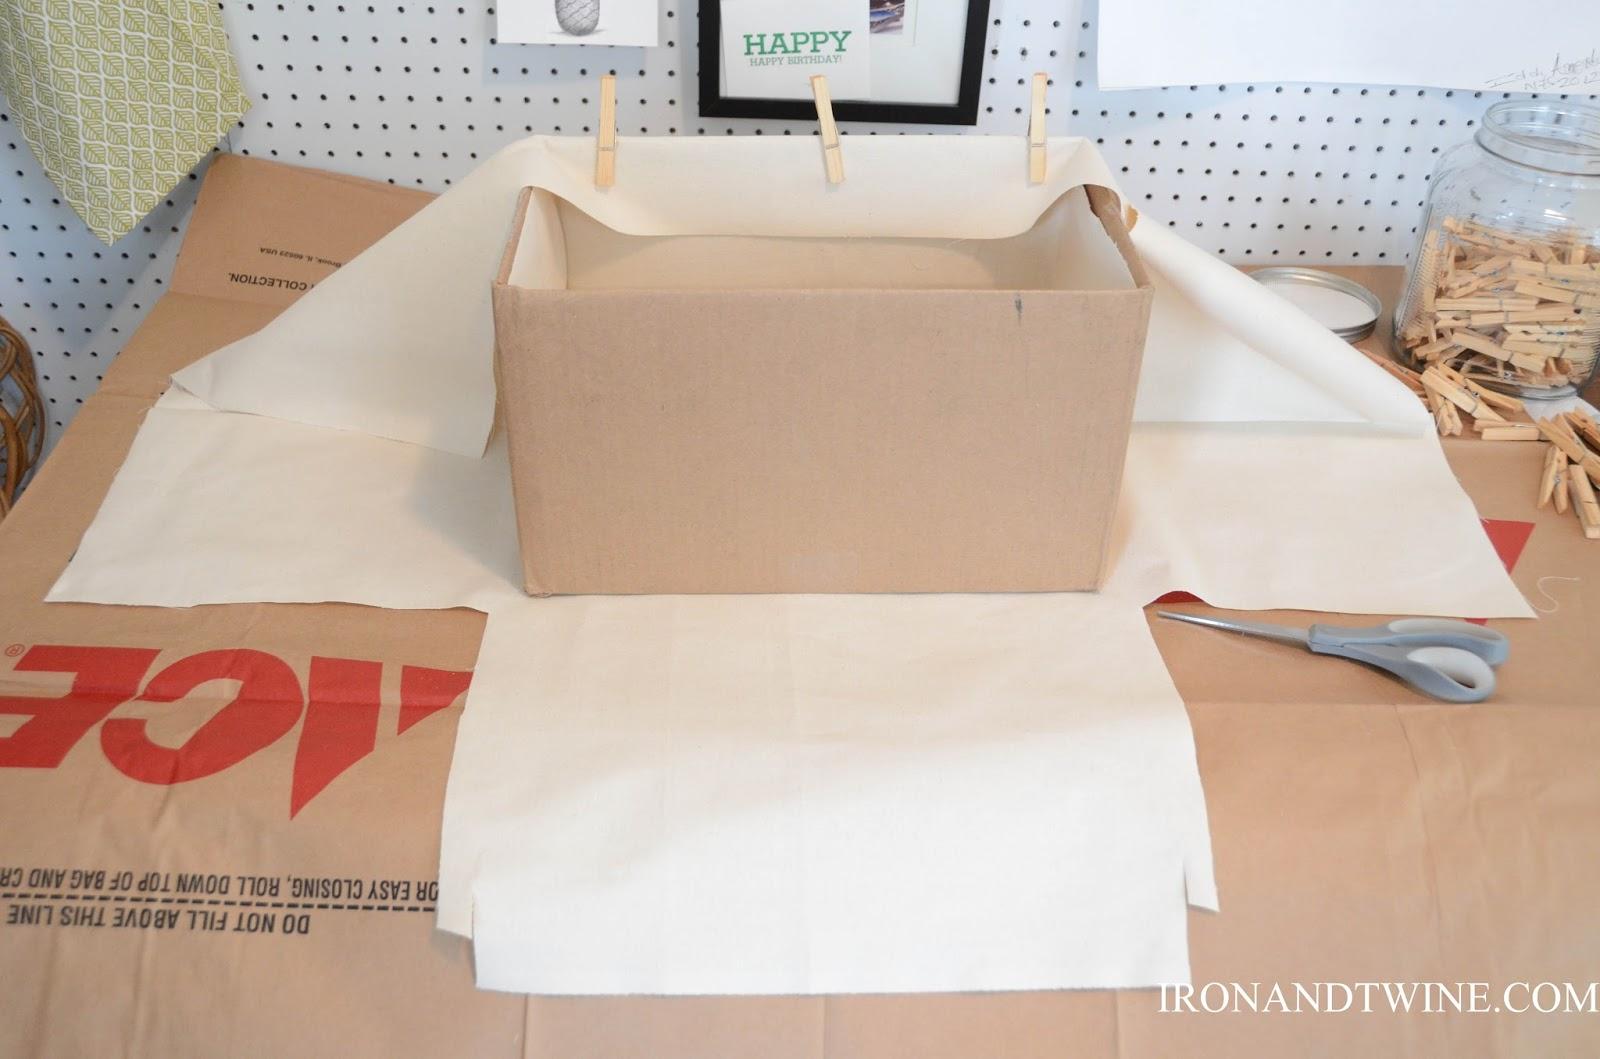 DIY+Belt+Handled+Box,+DIY+fabric+covered+box,+Iron+and+Twine+(23).jpg